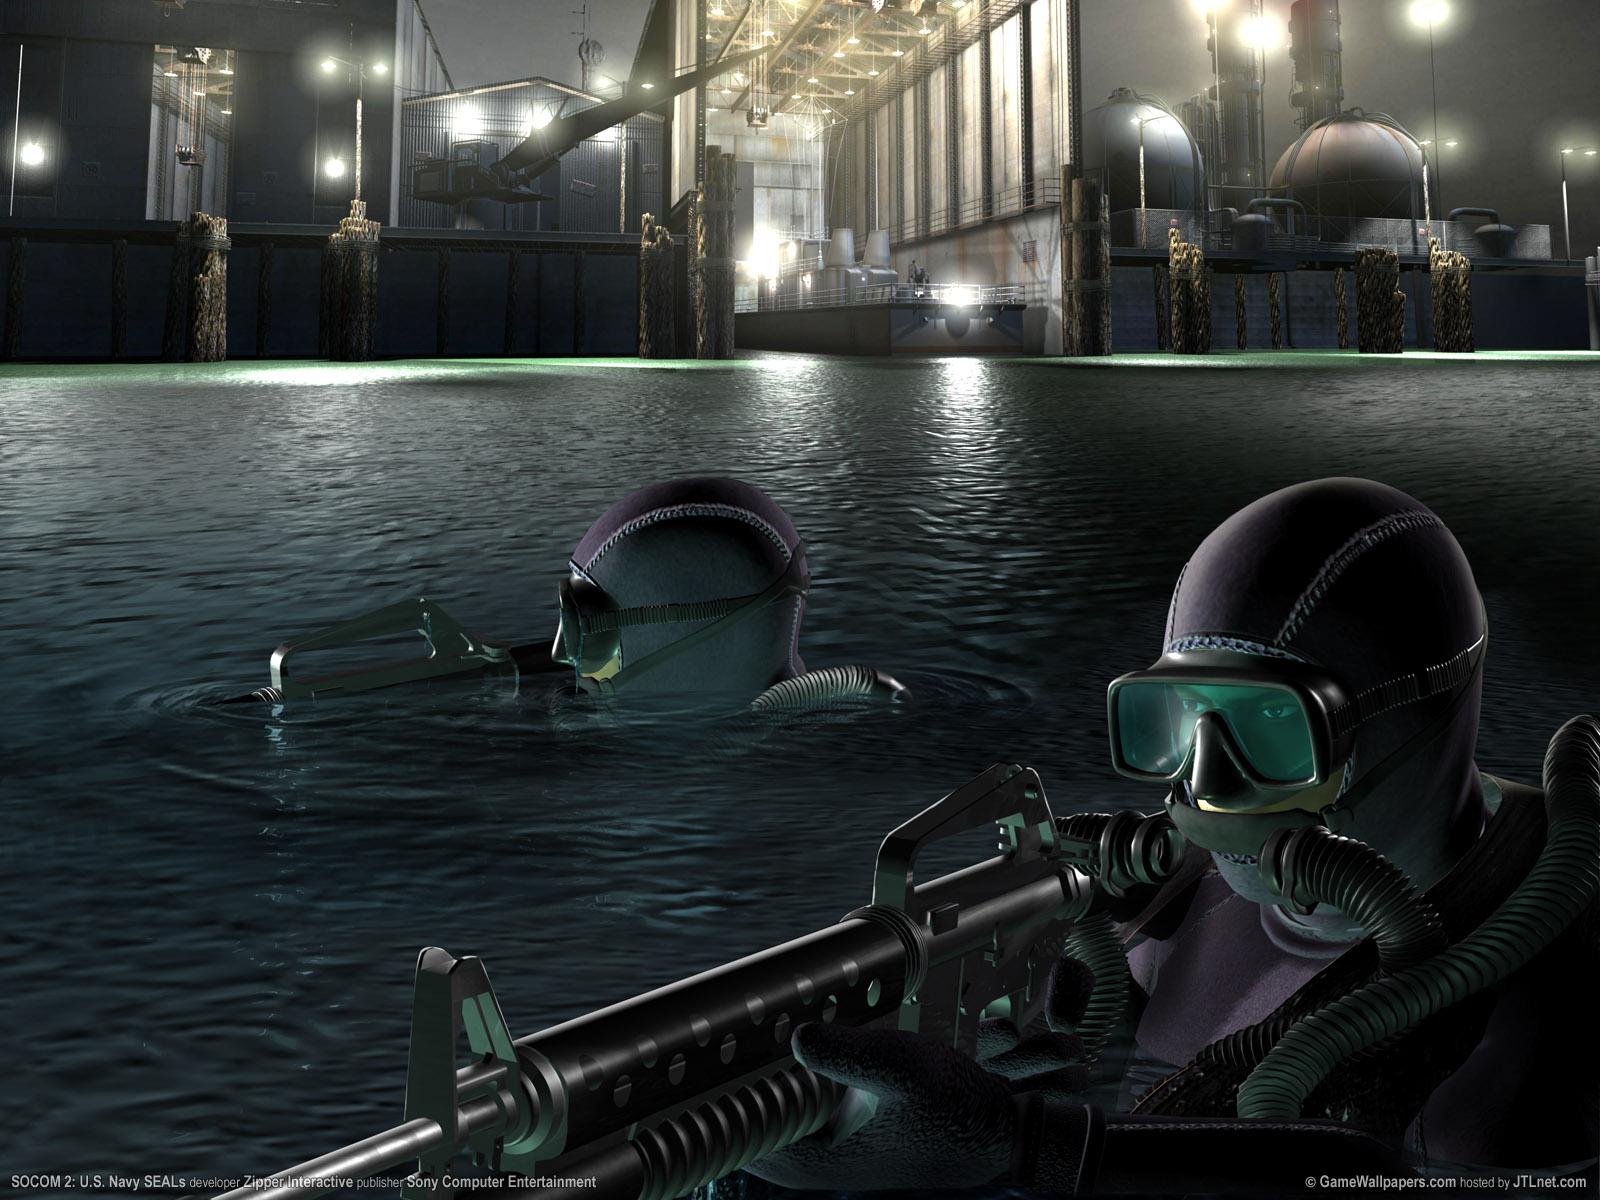 SOCOM 2 Navy Seals wallpapers SOCOM 2 Navy Seals stock photos 1600x1200